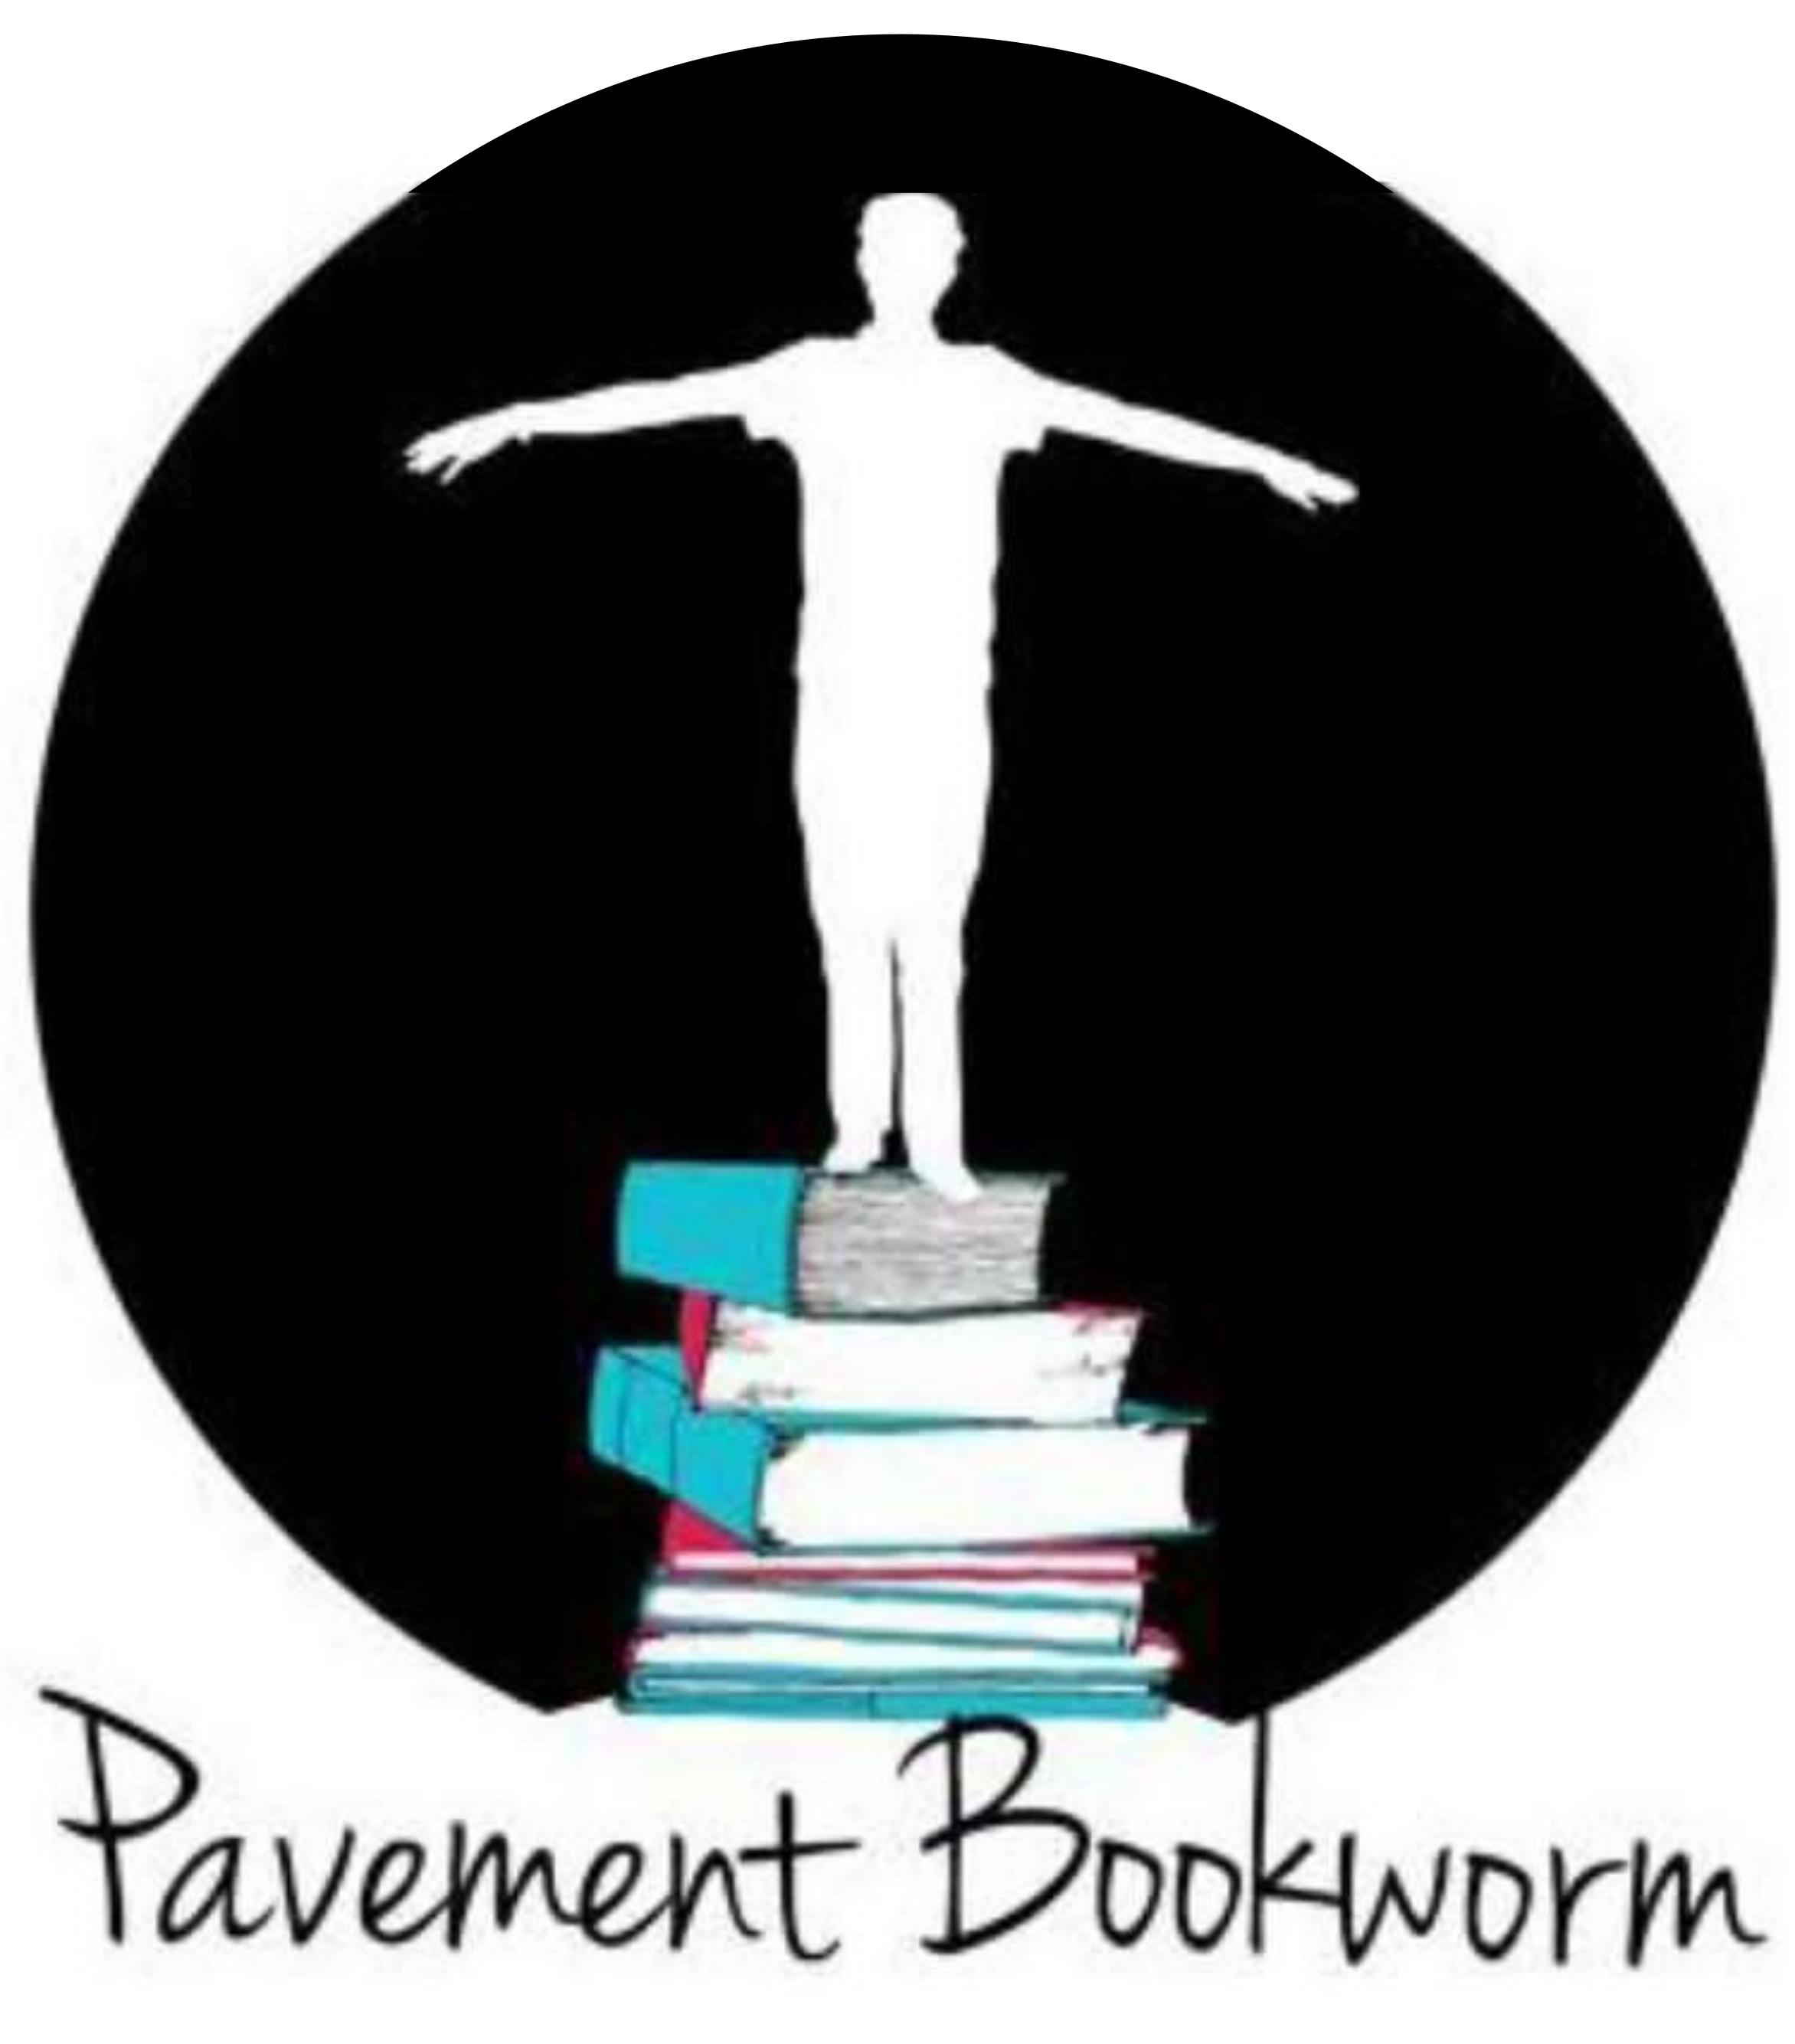 The Pavement Bookworm